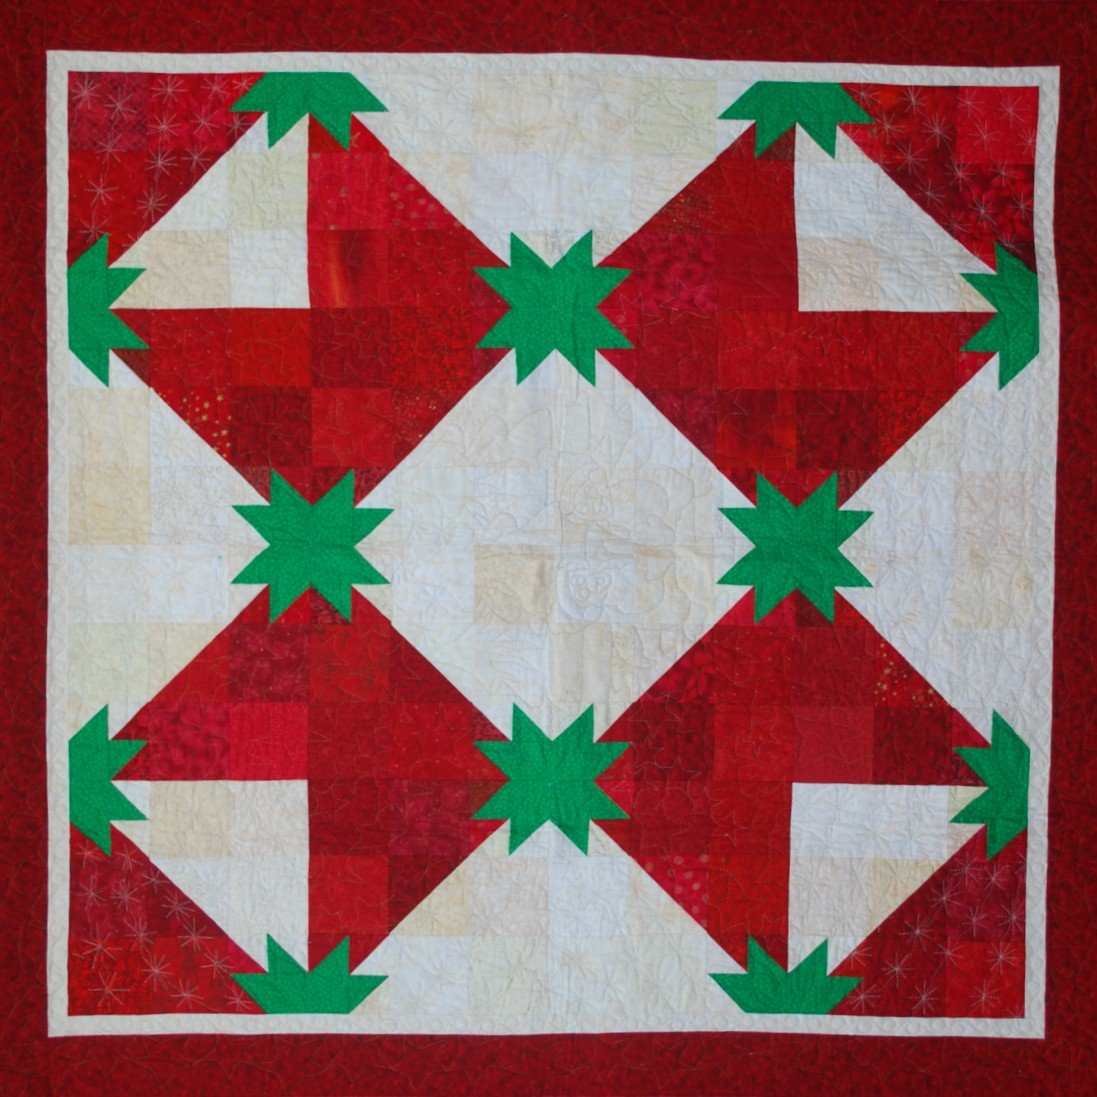 22-563 Christmas Scraphunter's Star 2